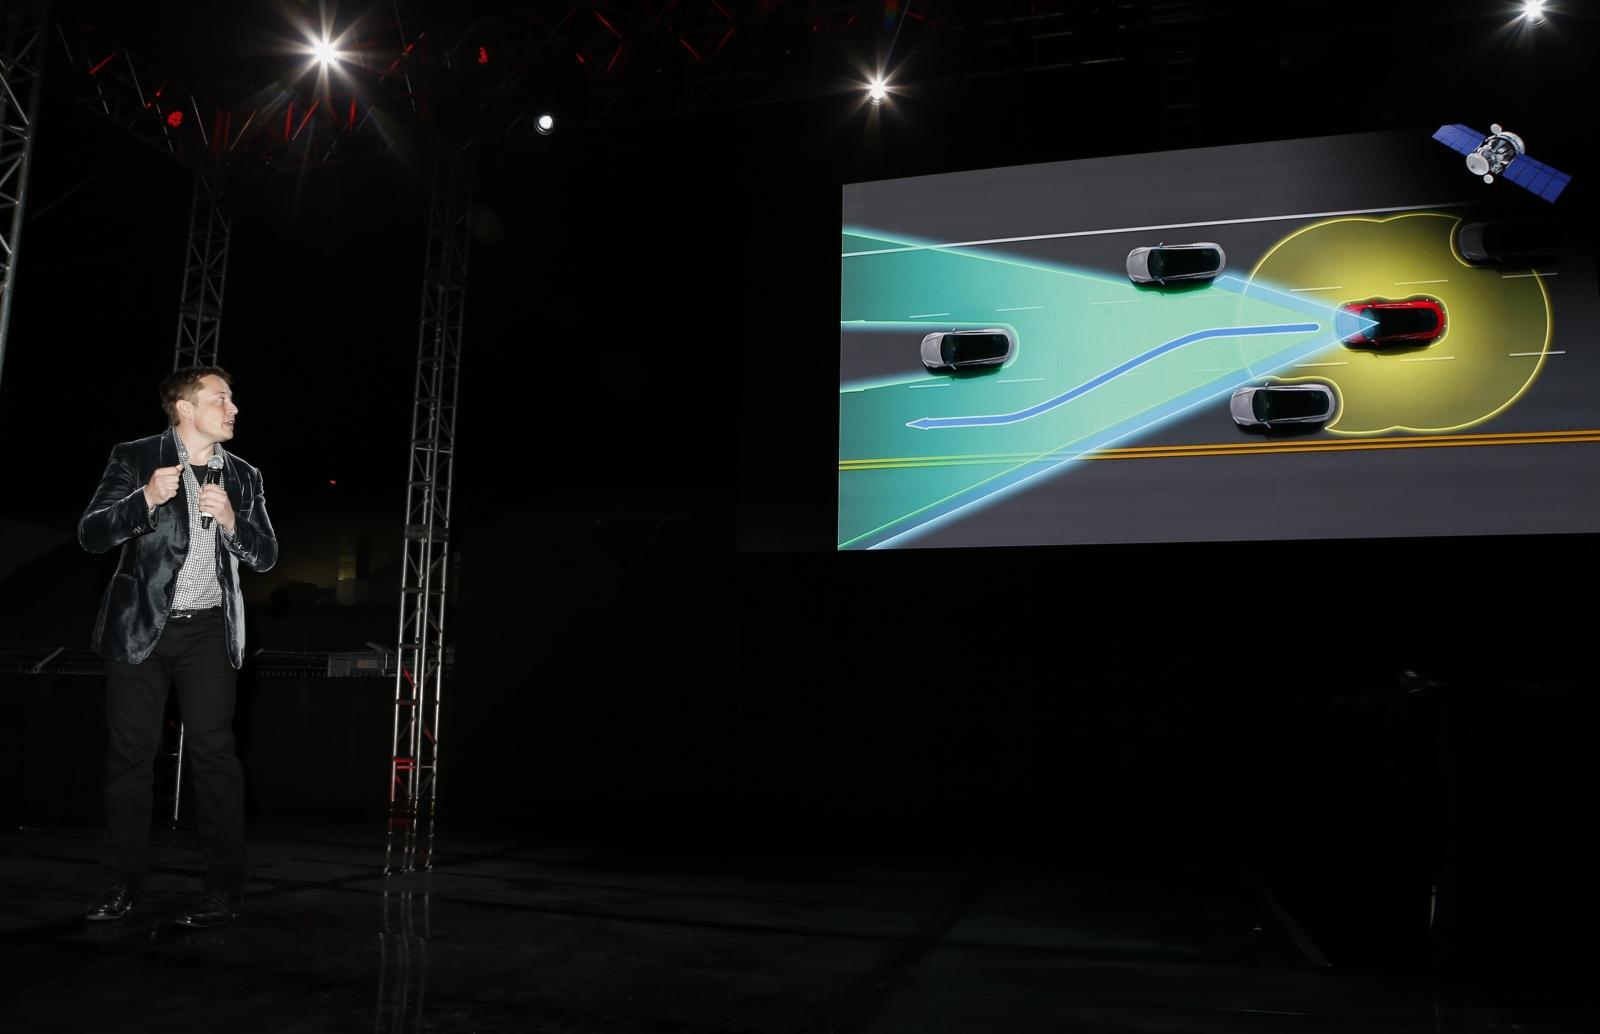 elon musk self-driving Tesla